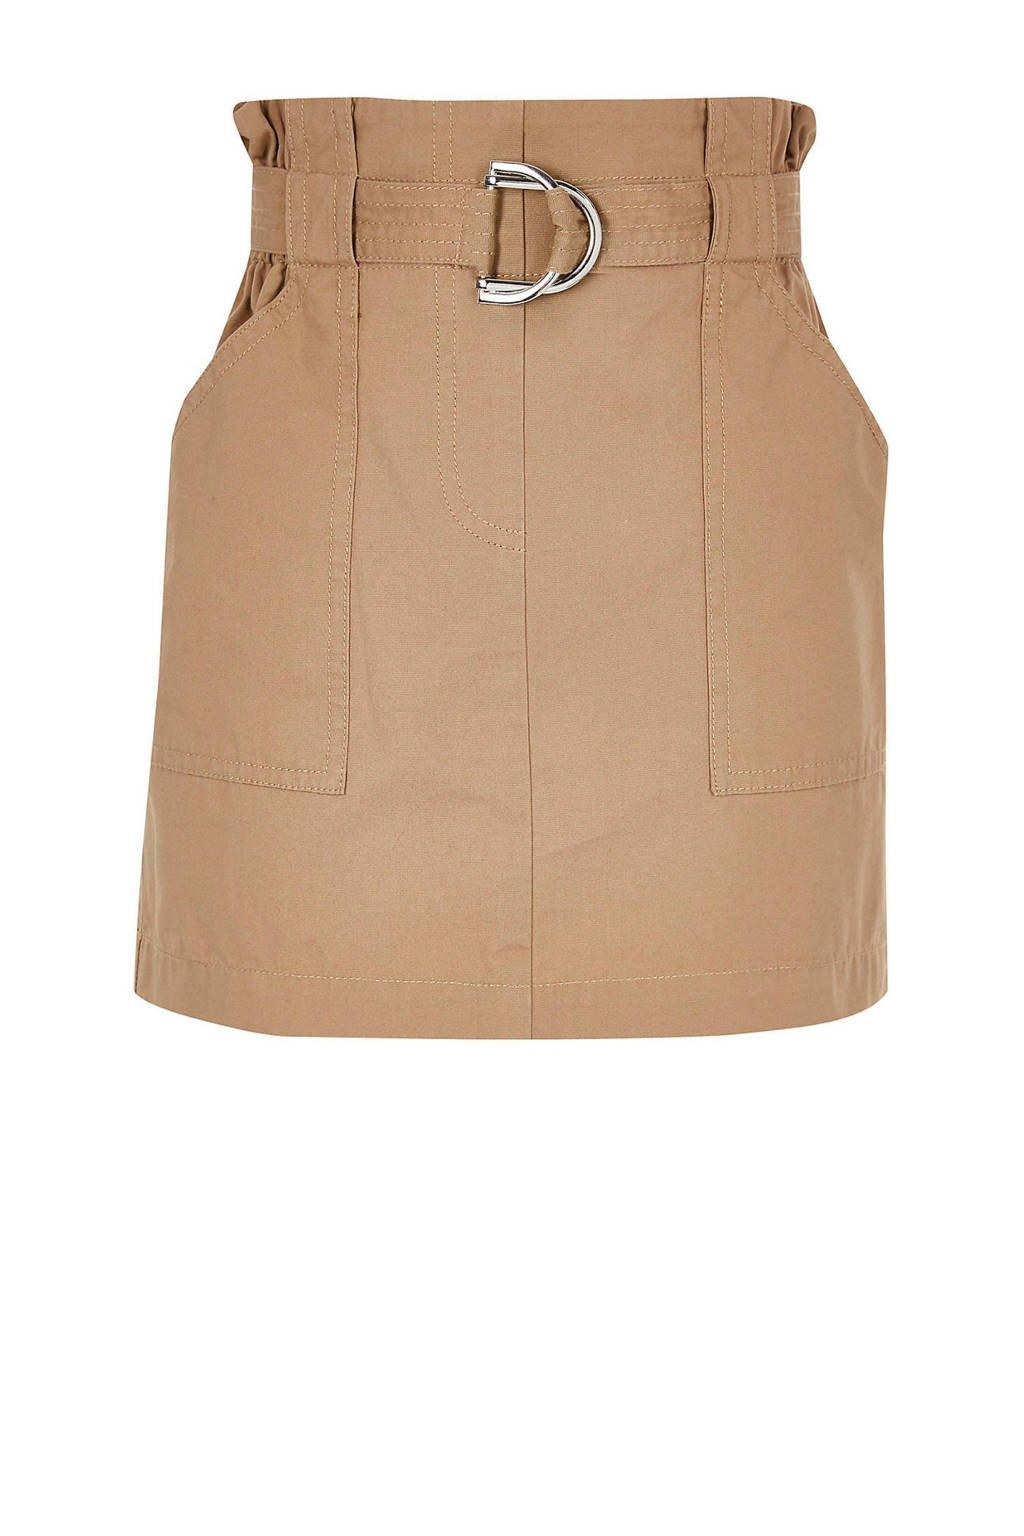 River Island paperbag rok beige, Beige